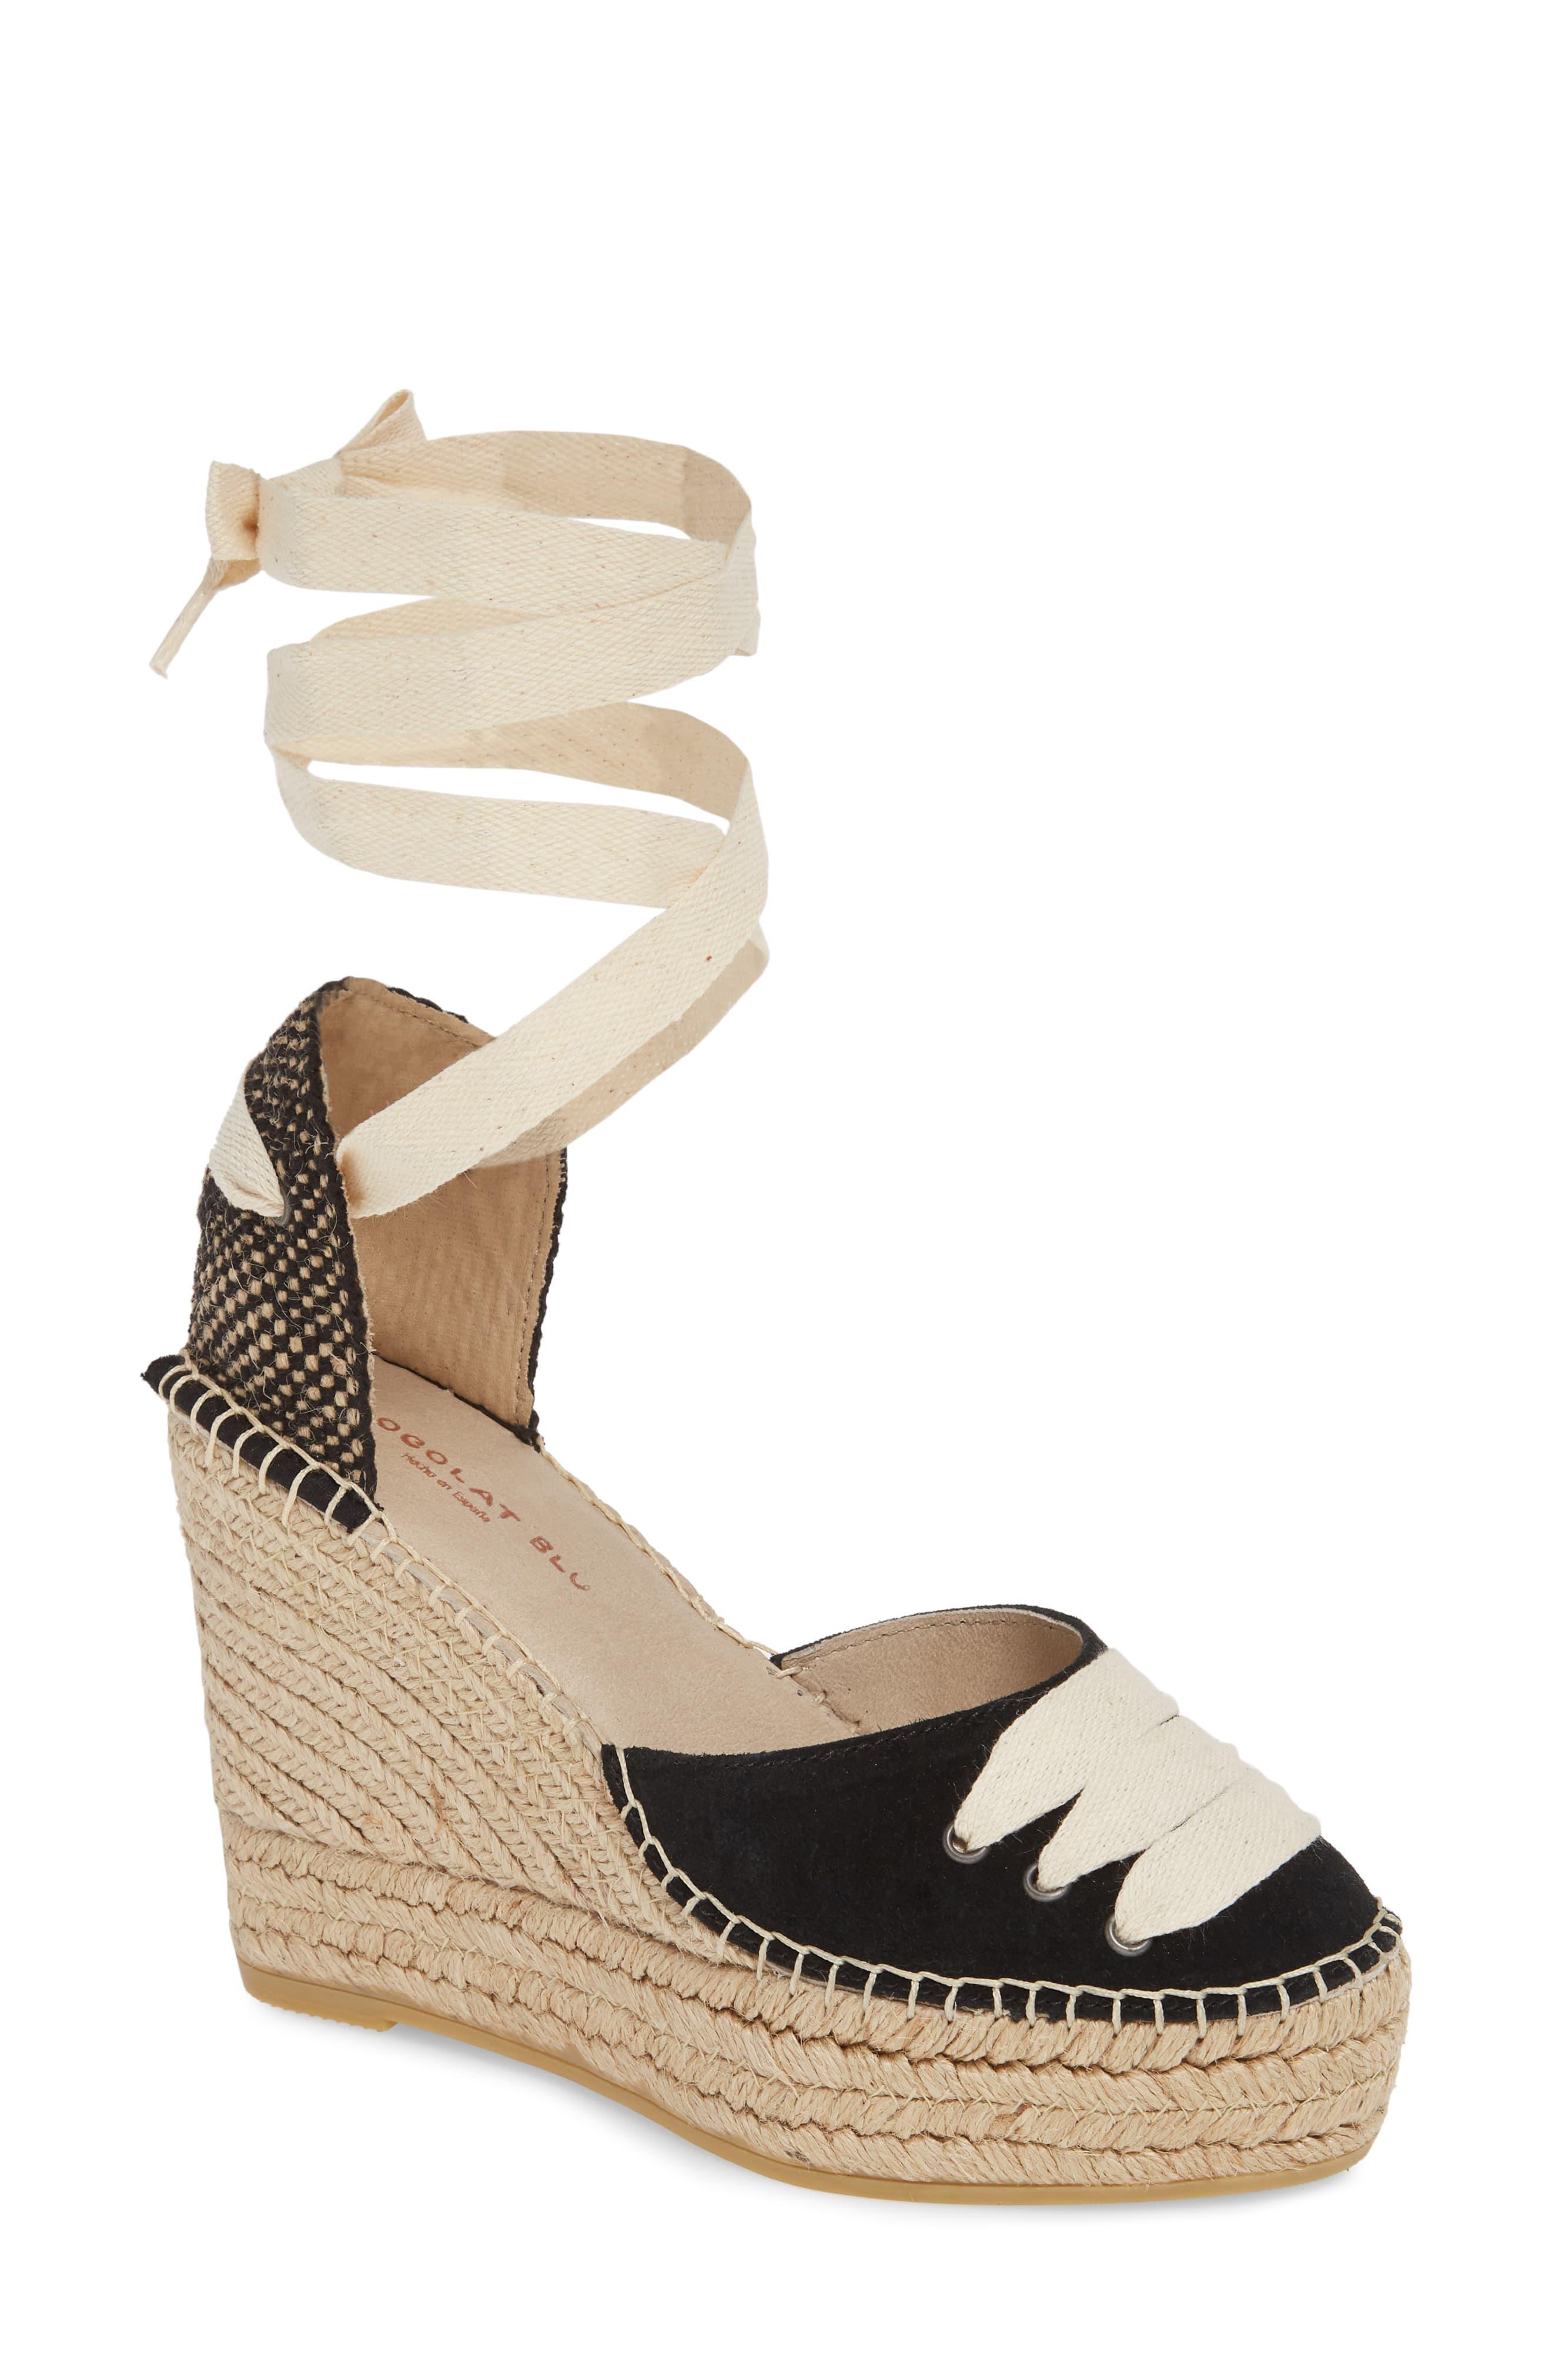 cc6a30efdd71c Women's Chocolat Blu Alma Ankle Wrap Wedge Espadrille, Size 9-9.5US ...